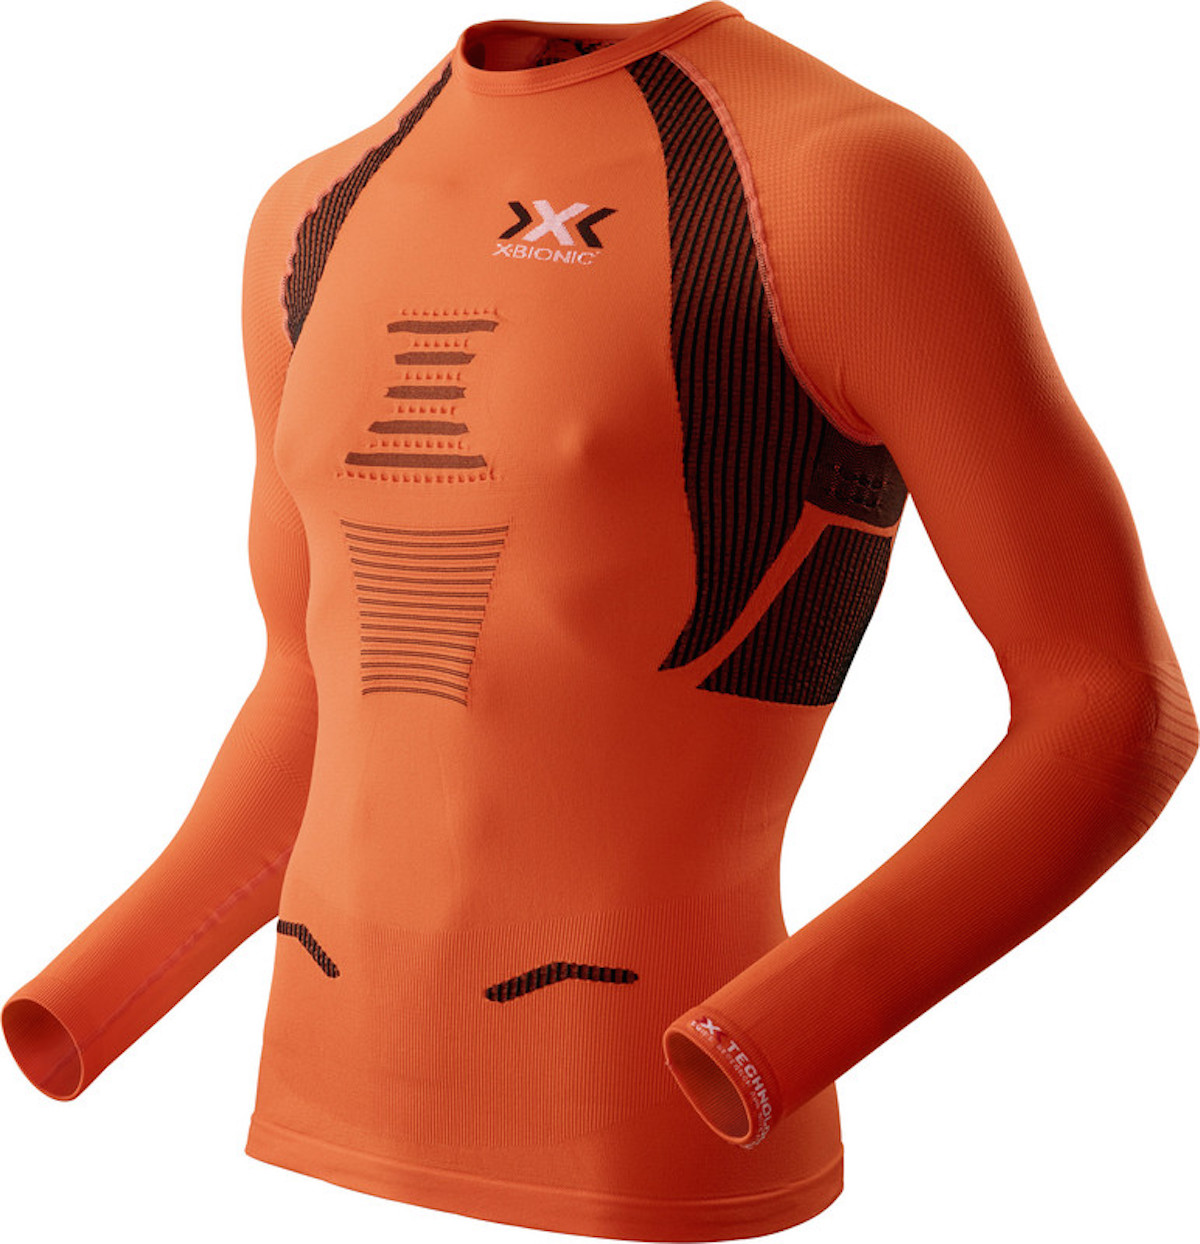 X-Bionic Running The Trick - Funktionsshirt - Herren